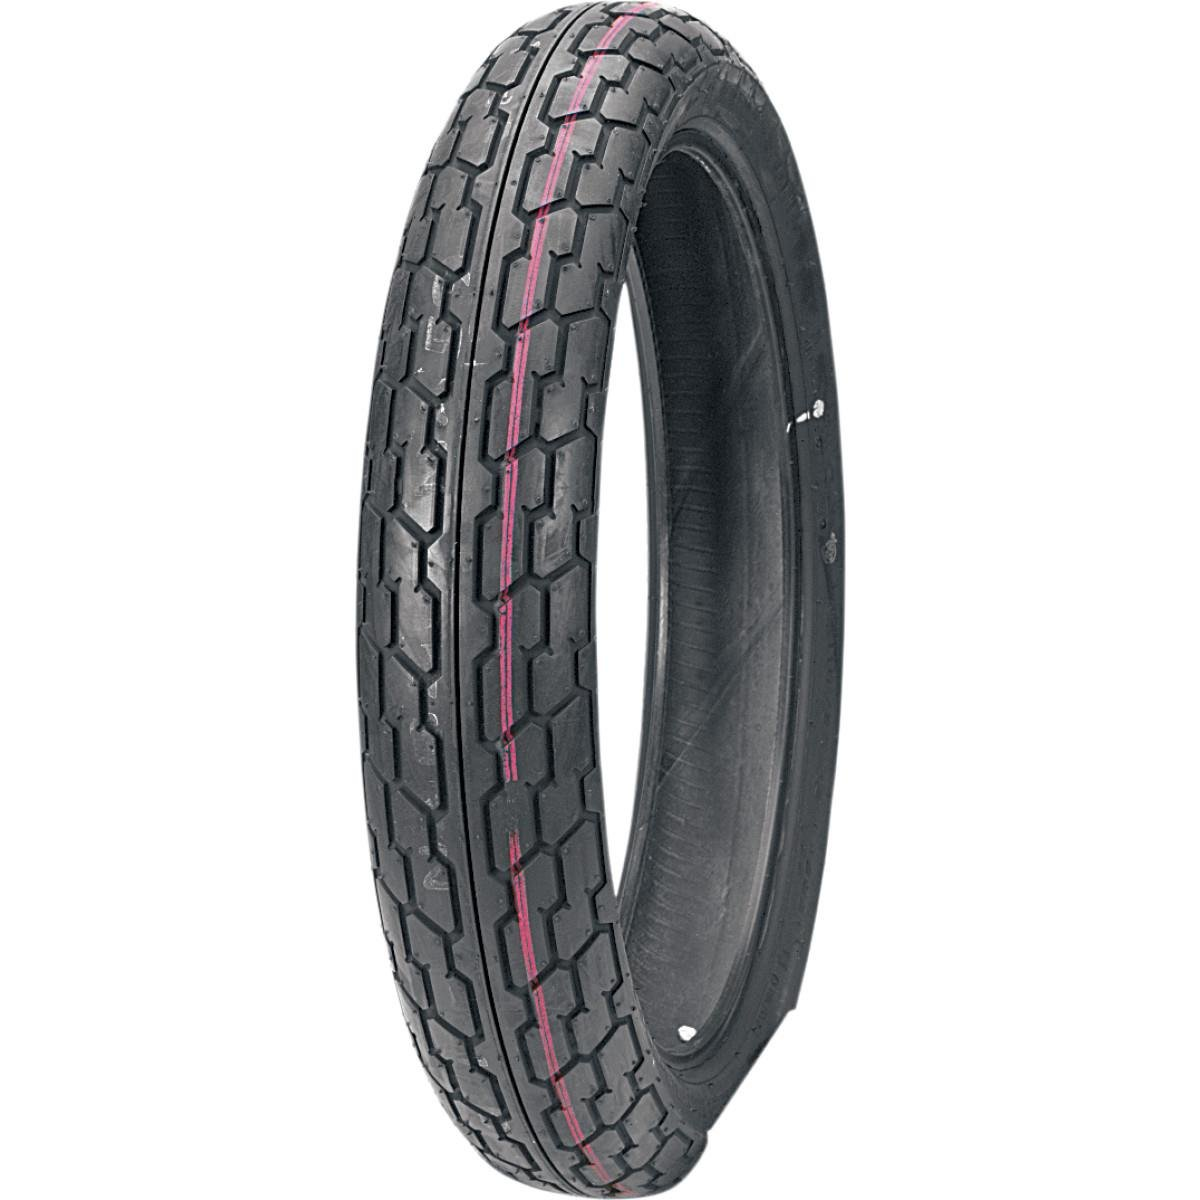 Bridgestone G515 Cruiser Front Motorcycle Tire 110/80-19